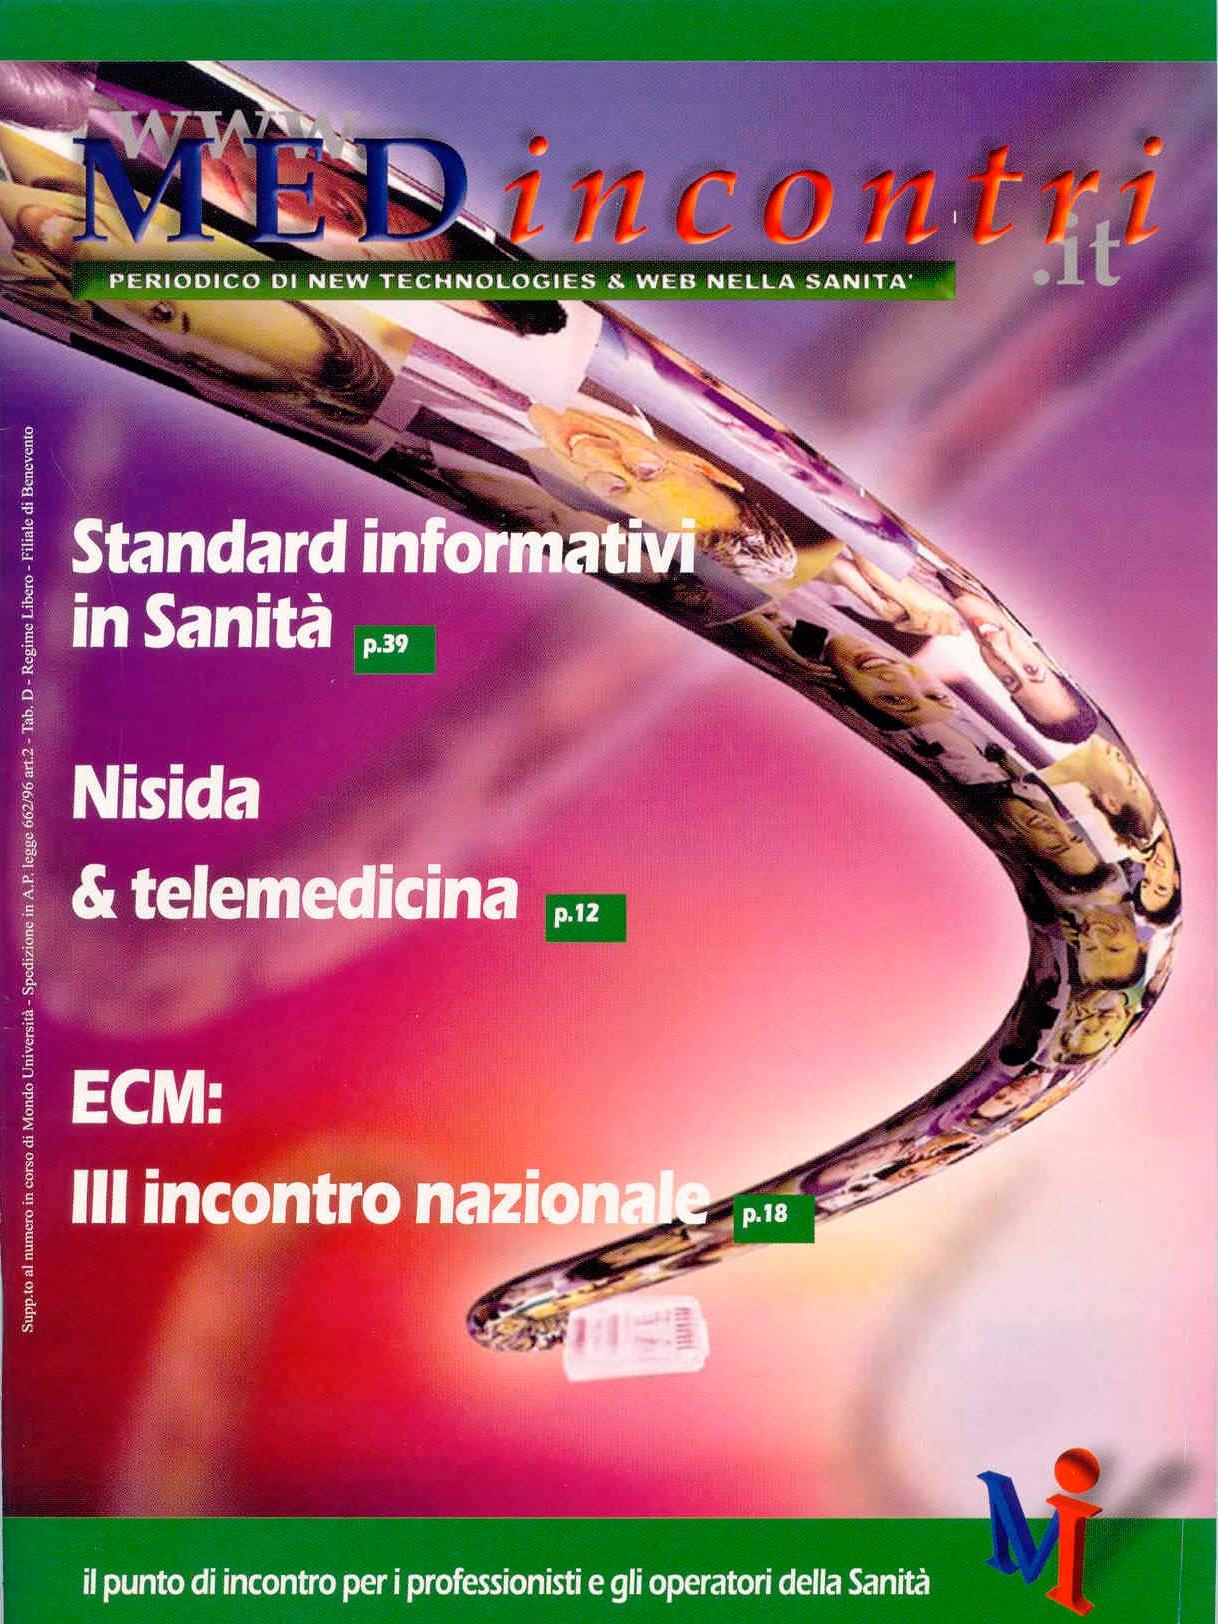 MEDINCONTRIcop_web